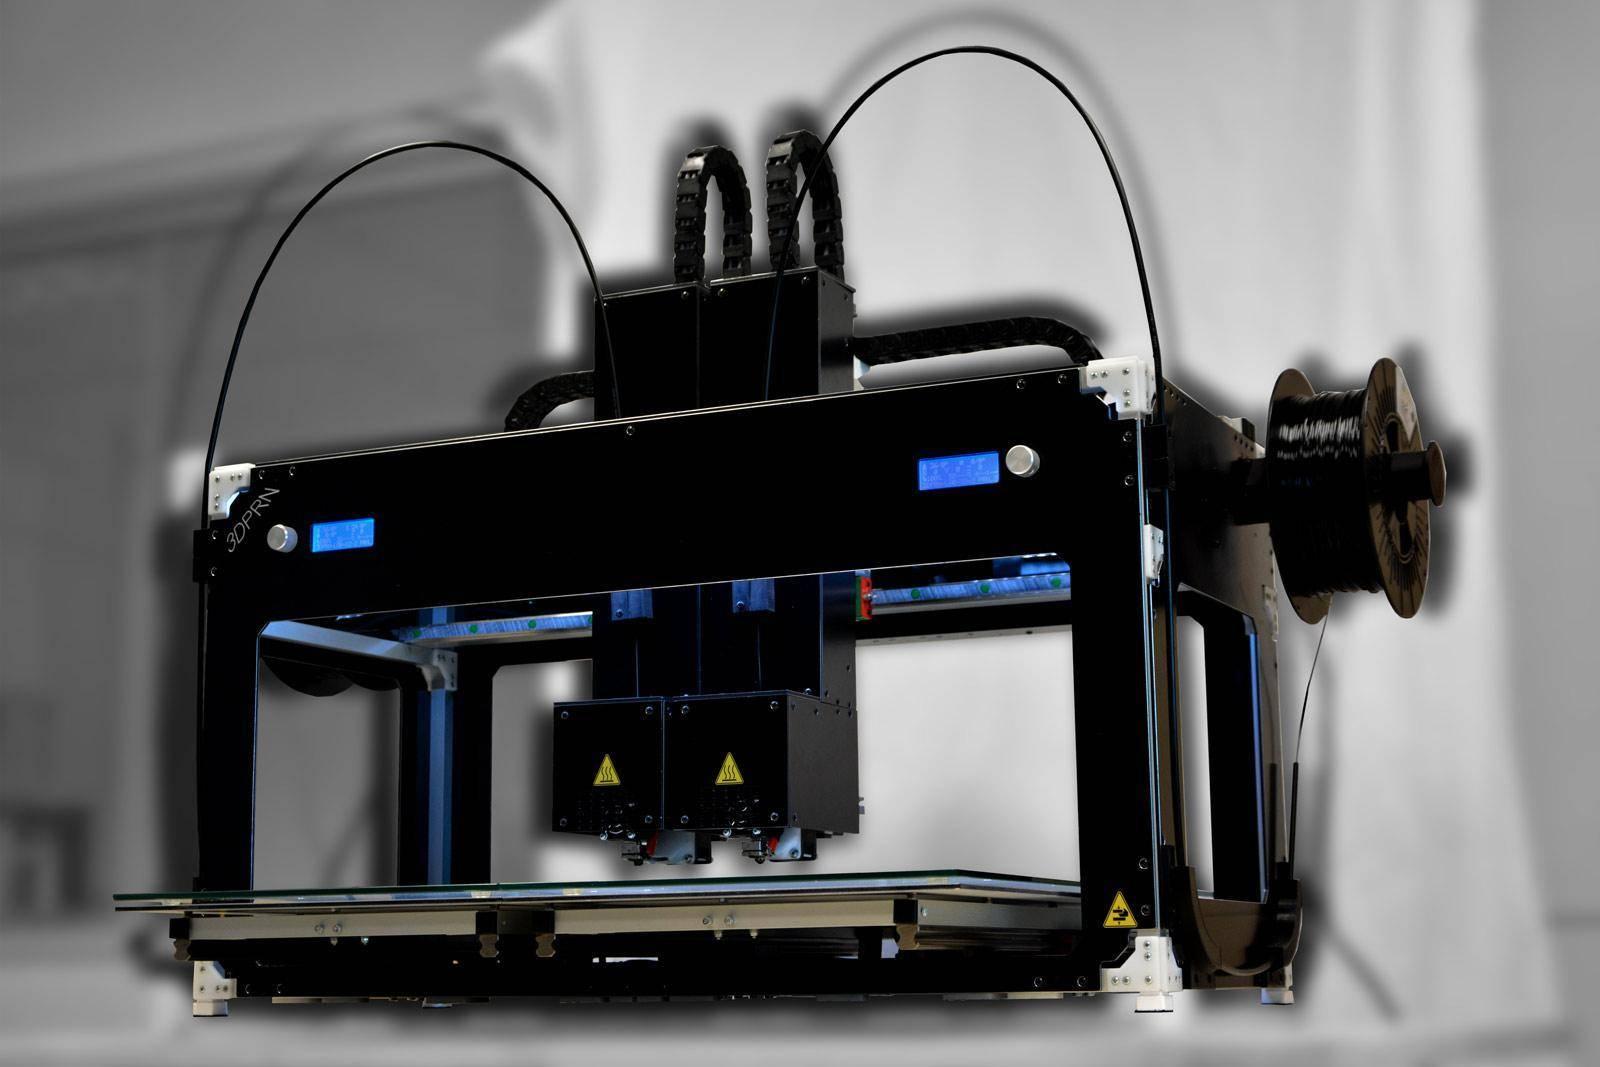 stampante 3D professionale tips x2 2 - Stampanti 3D Professionali